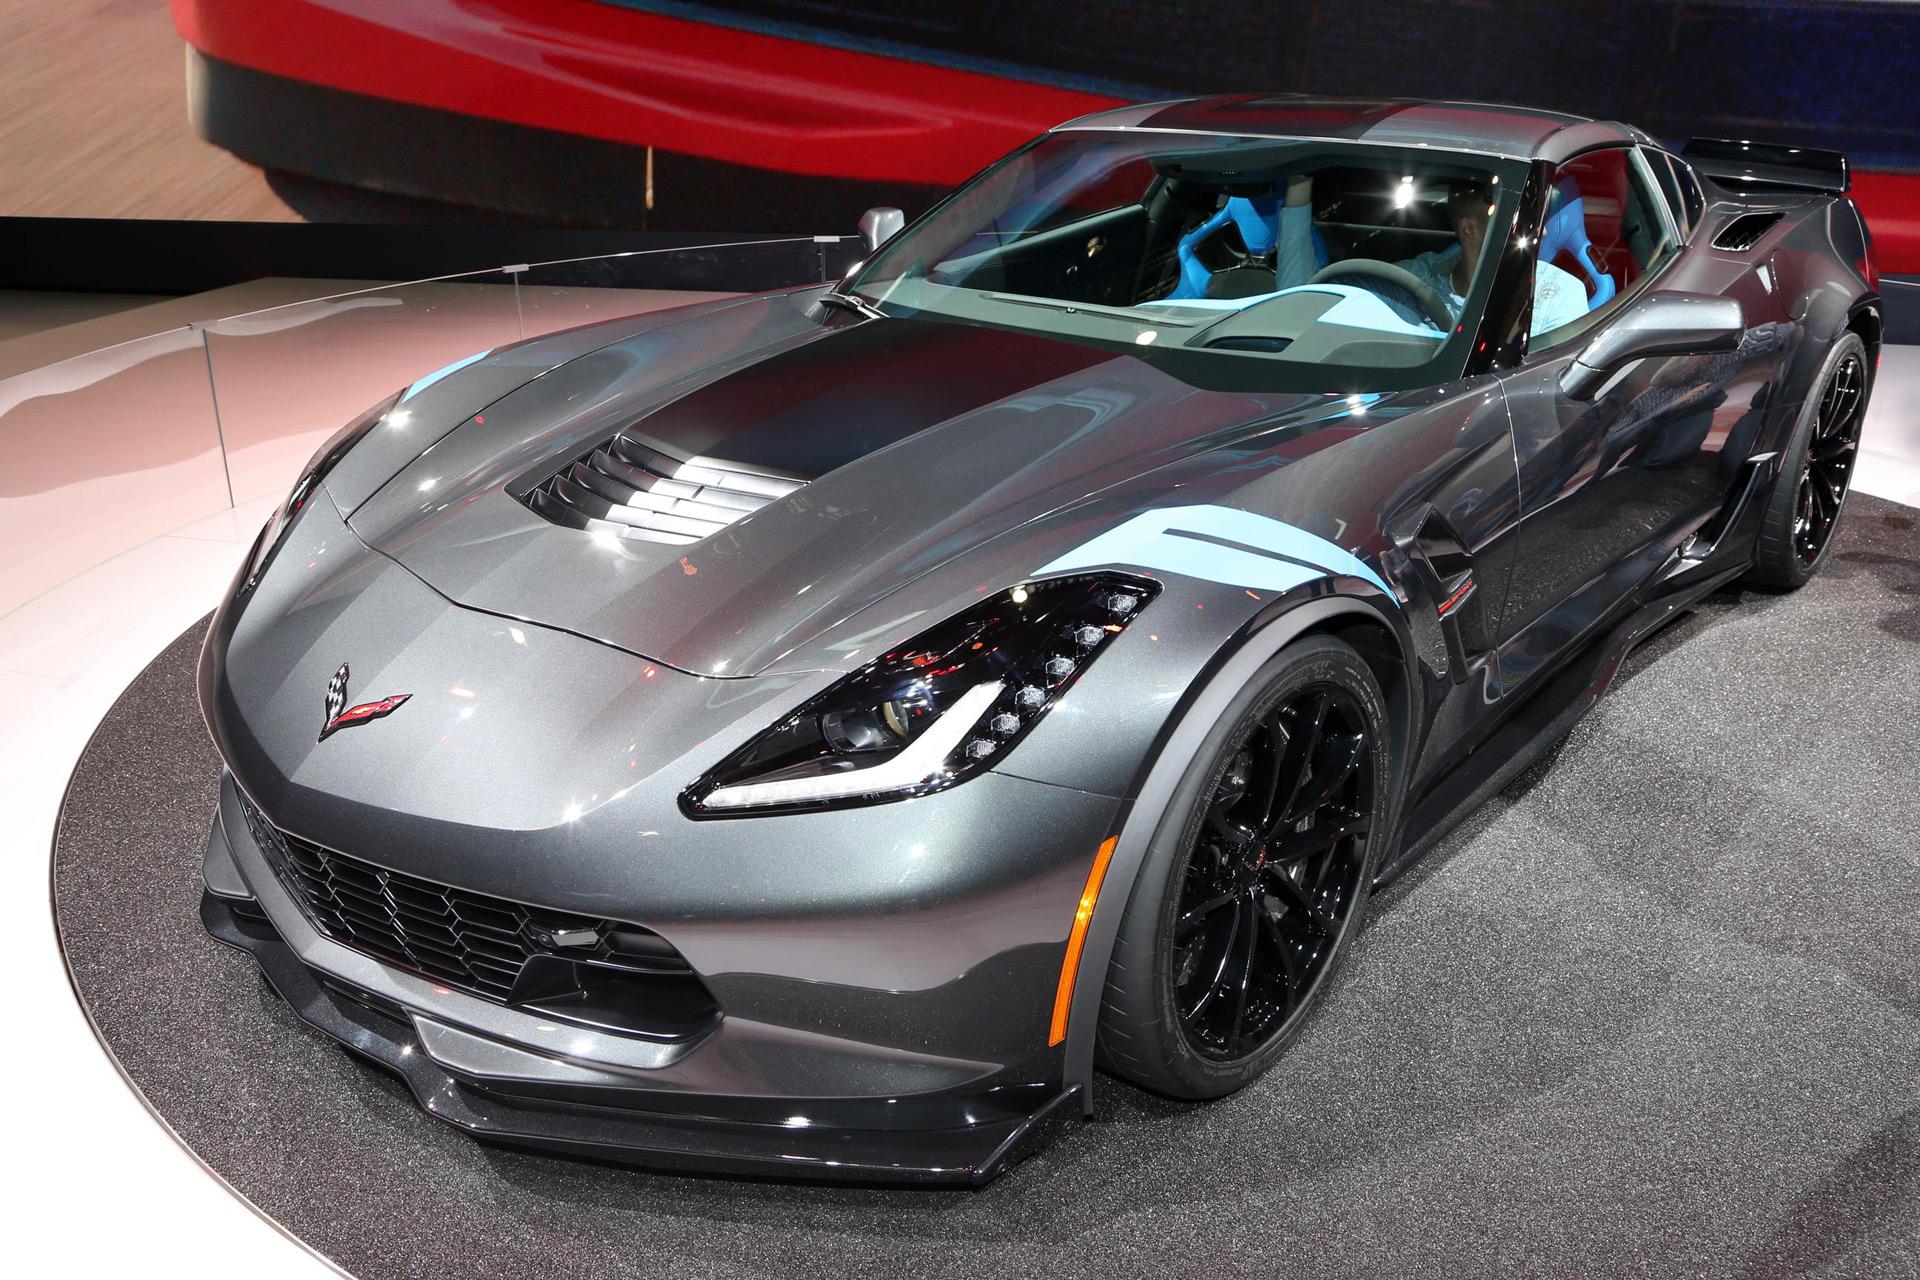 2017 Chevrolet Corvette Stingray >> 2017 Chevrolet Corvette Wp Tour